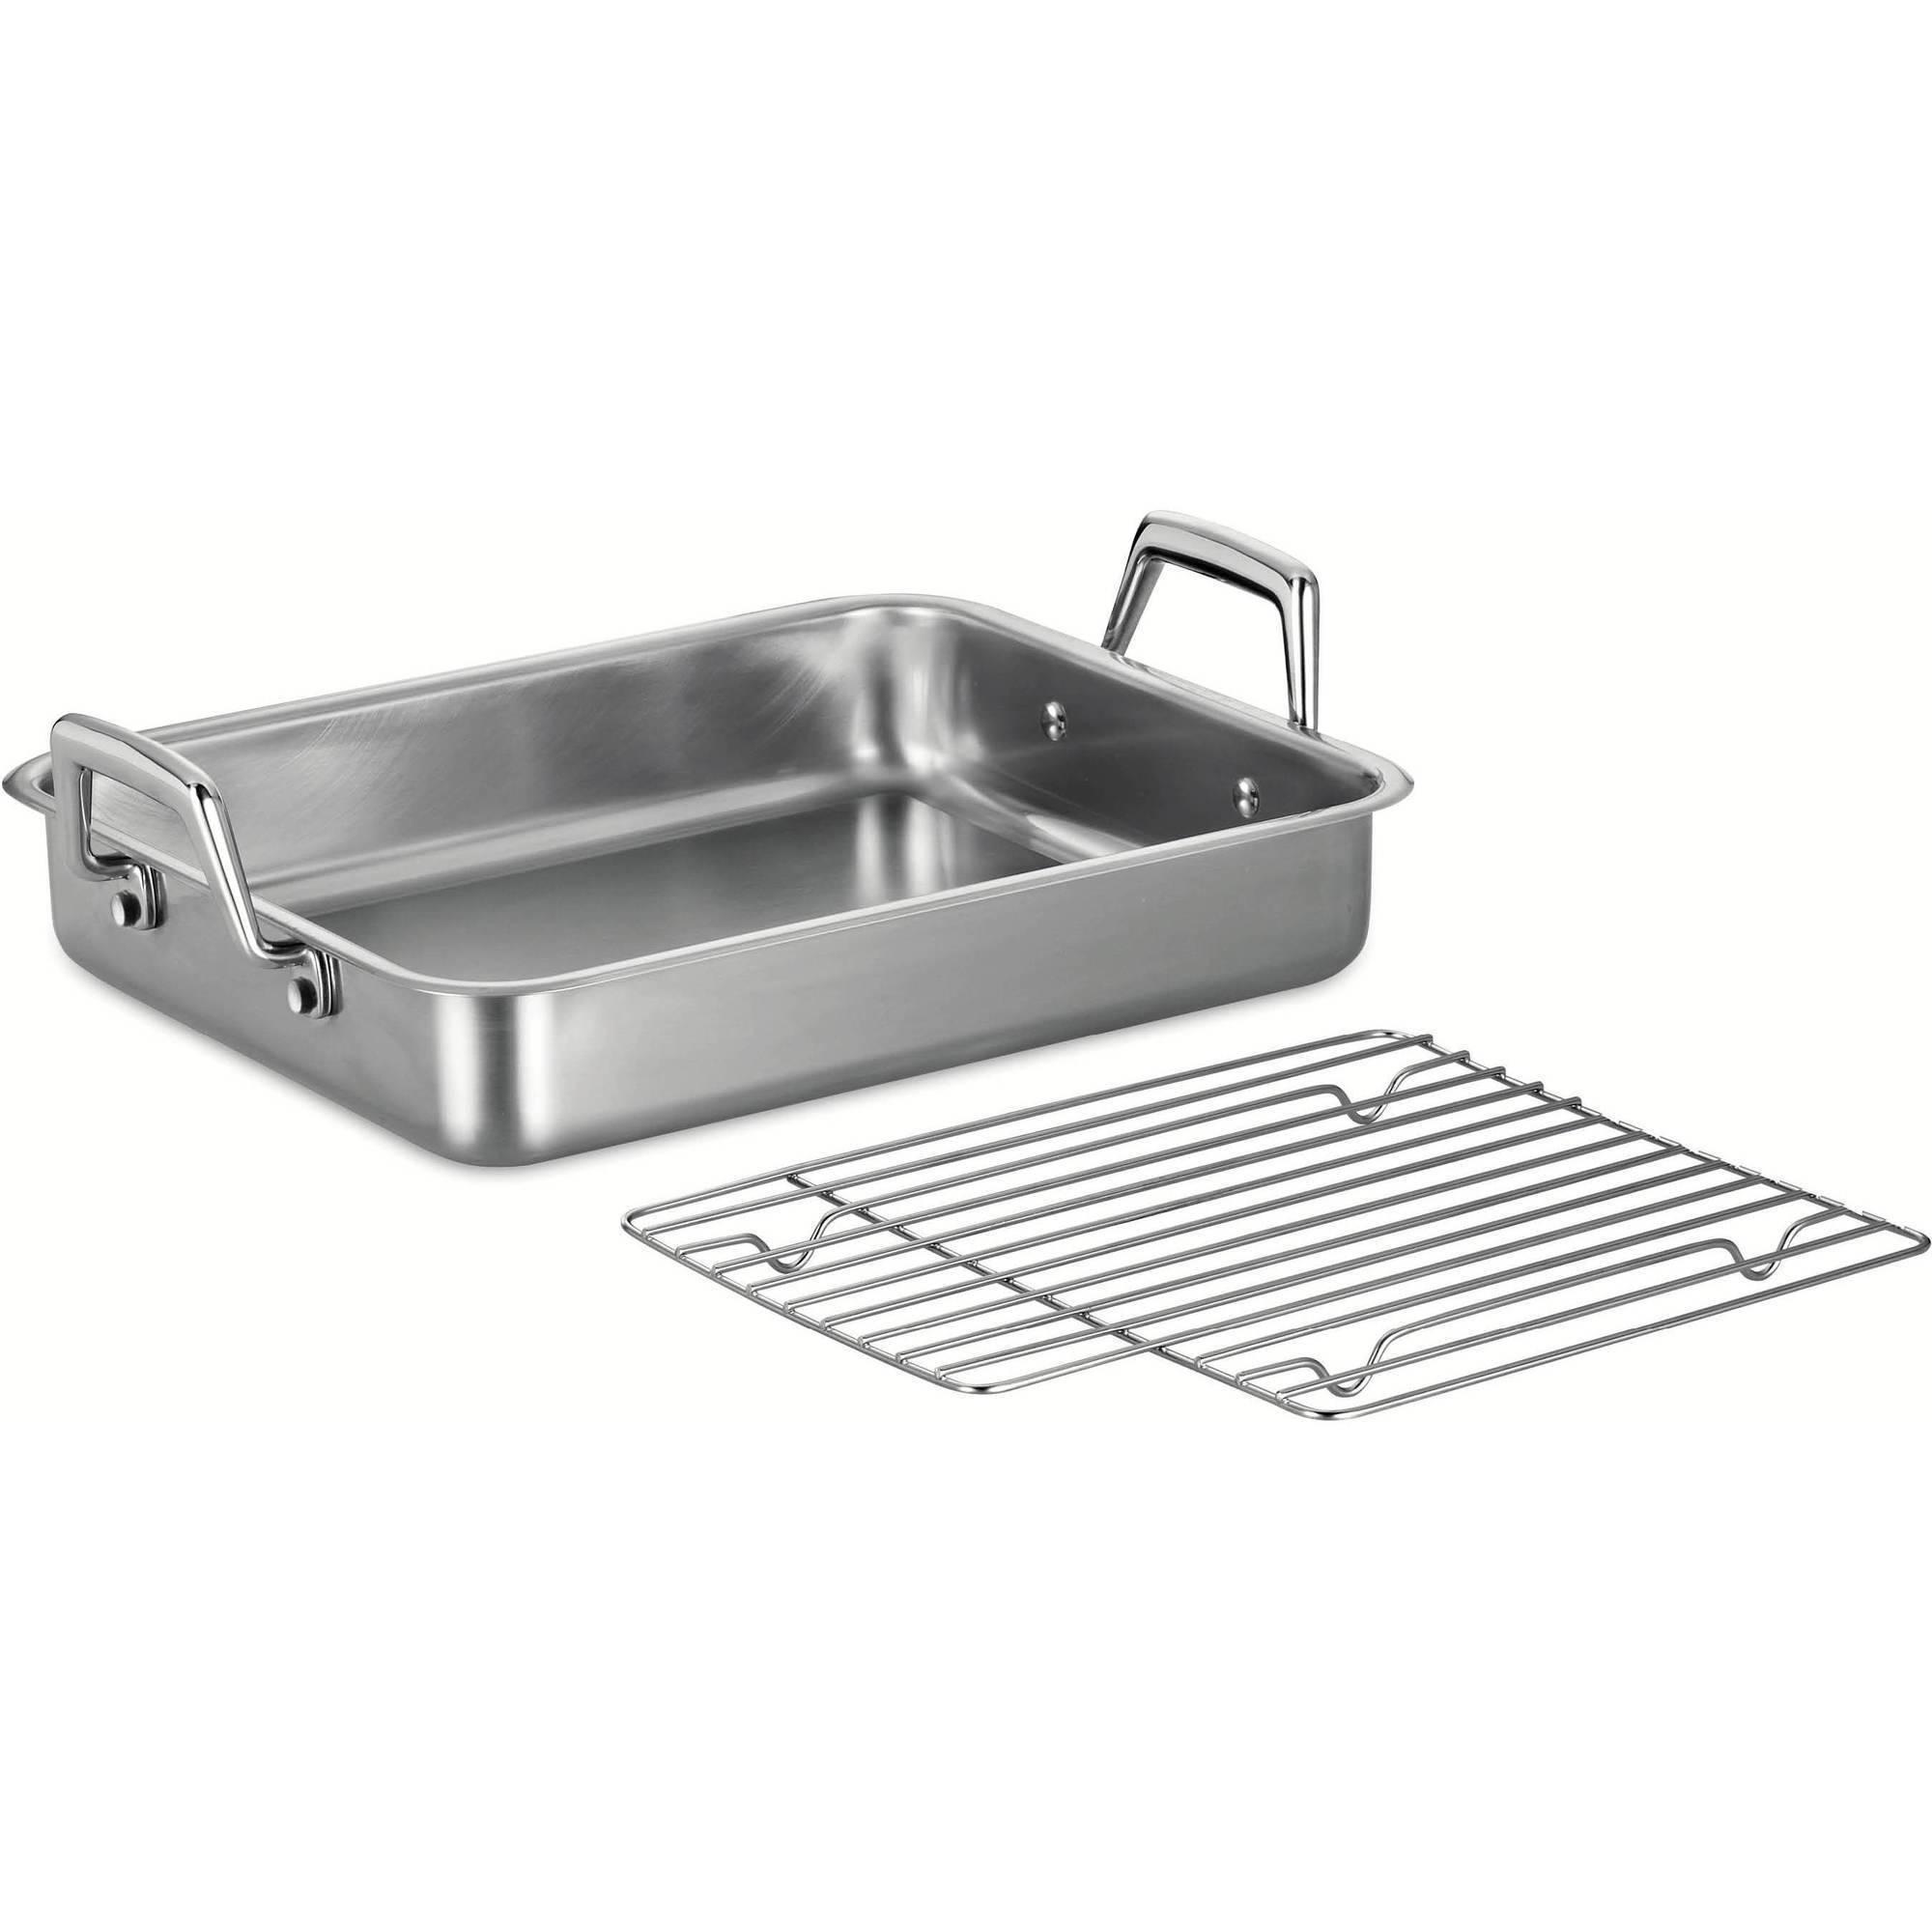 "Tramontina Prima 13.5"" Roasting Pan with Basting Grill"